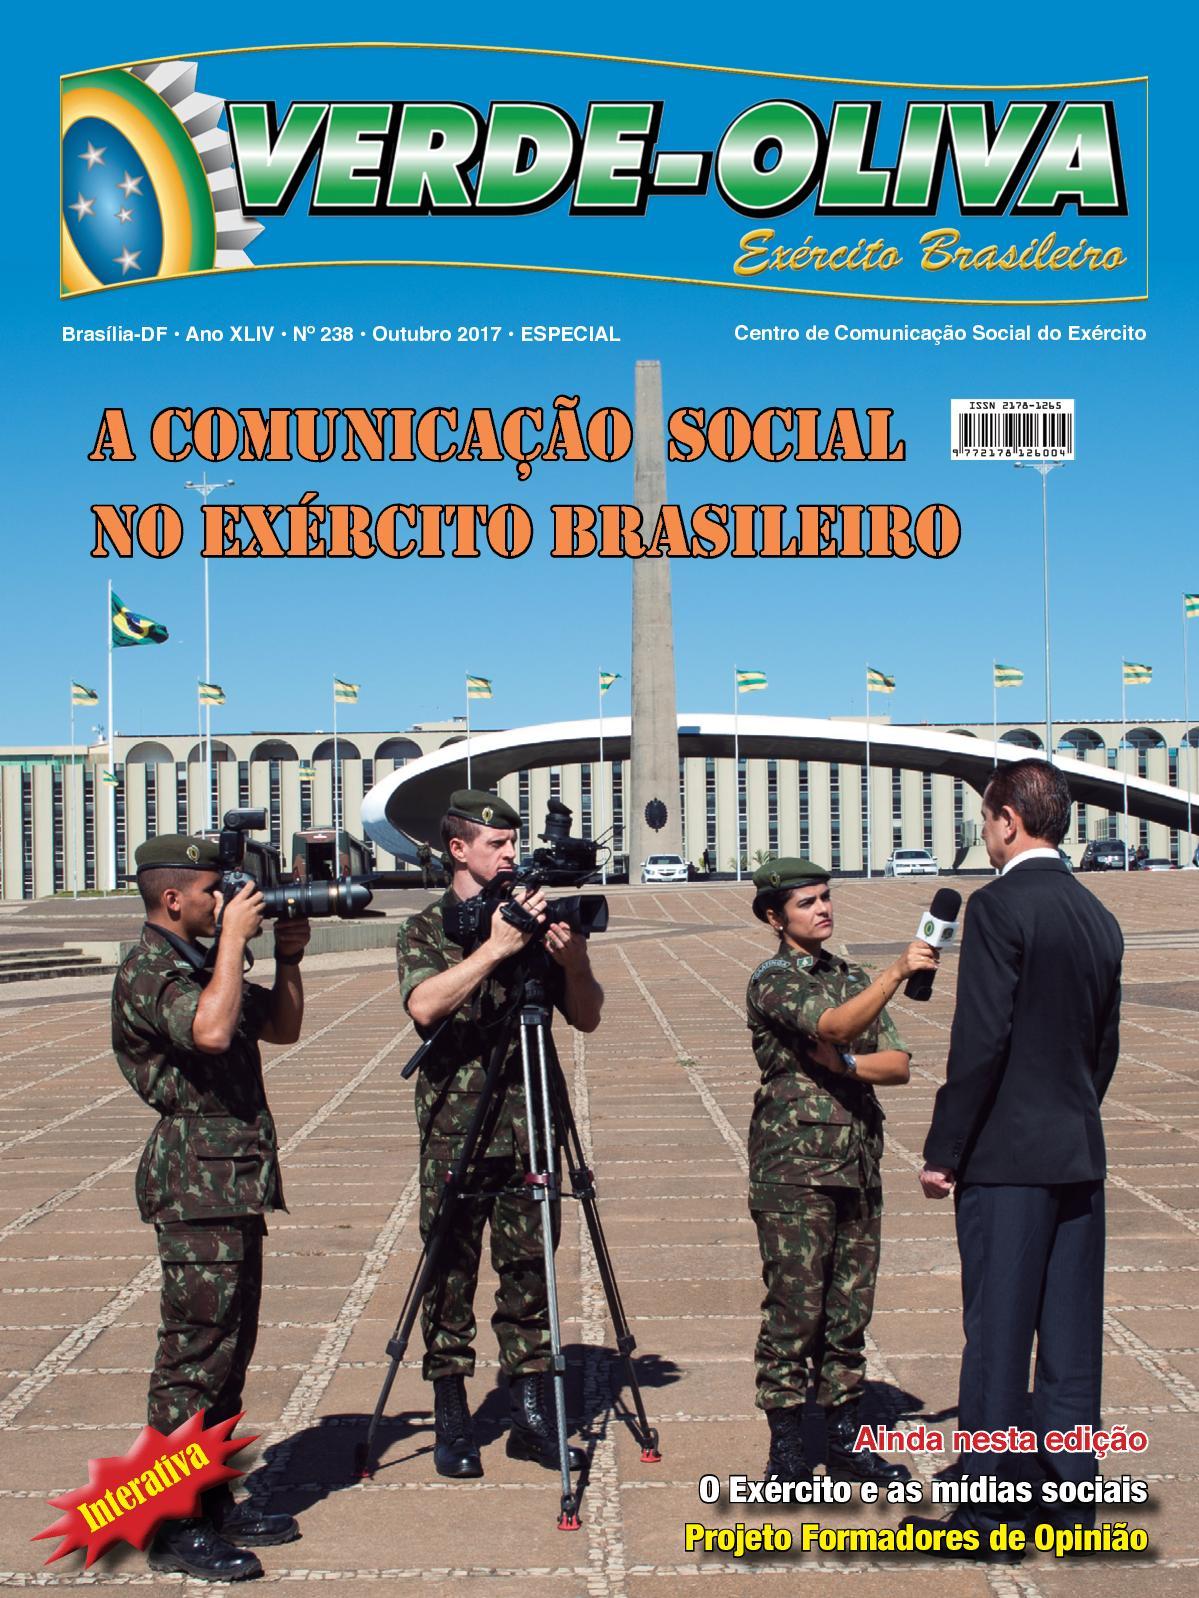 Calaméo - Revista Verde-Oliva Nº 238 INTERATIVA 28db1e11034